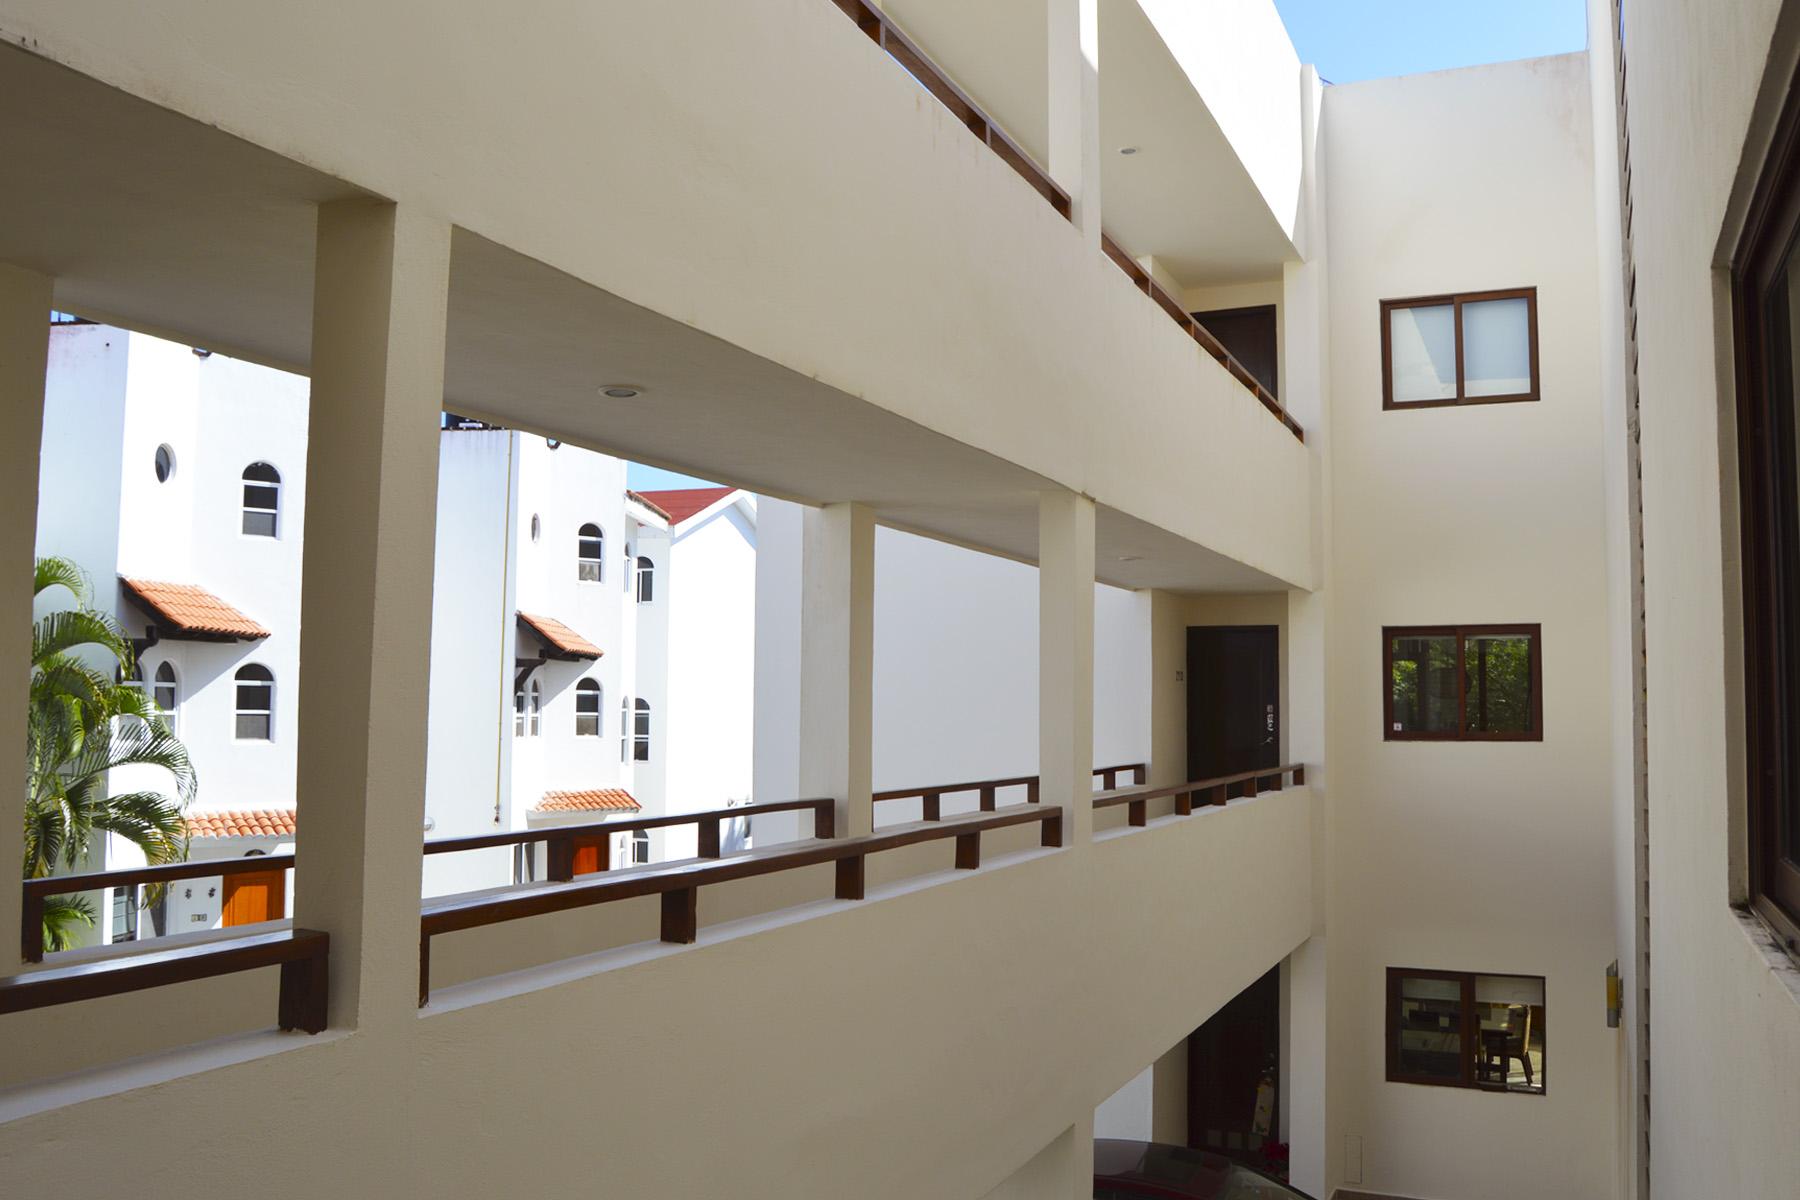 Additional photo for property listing at AKOYA LUXURY CONDO Akoya, Villas Pakal Ret 3 Chichenitza Lot 19 Mza 16 Playa Del Carmen, Quintana Roo 77710 Mexico